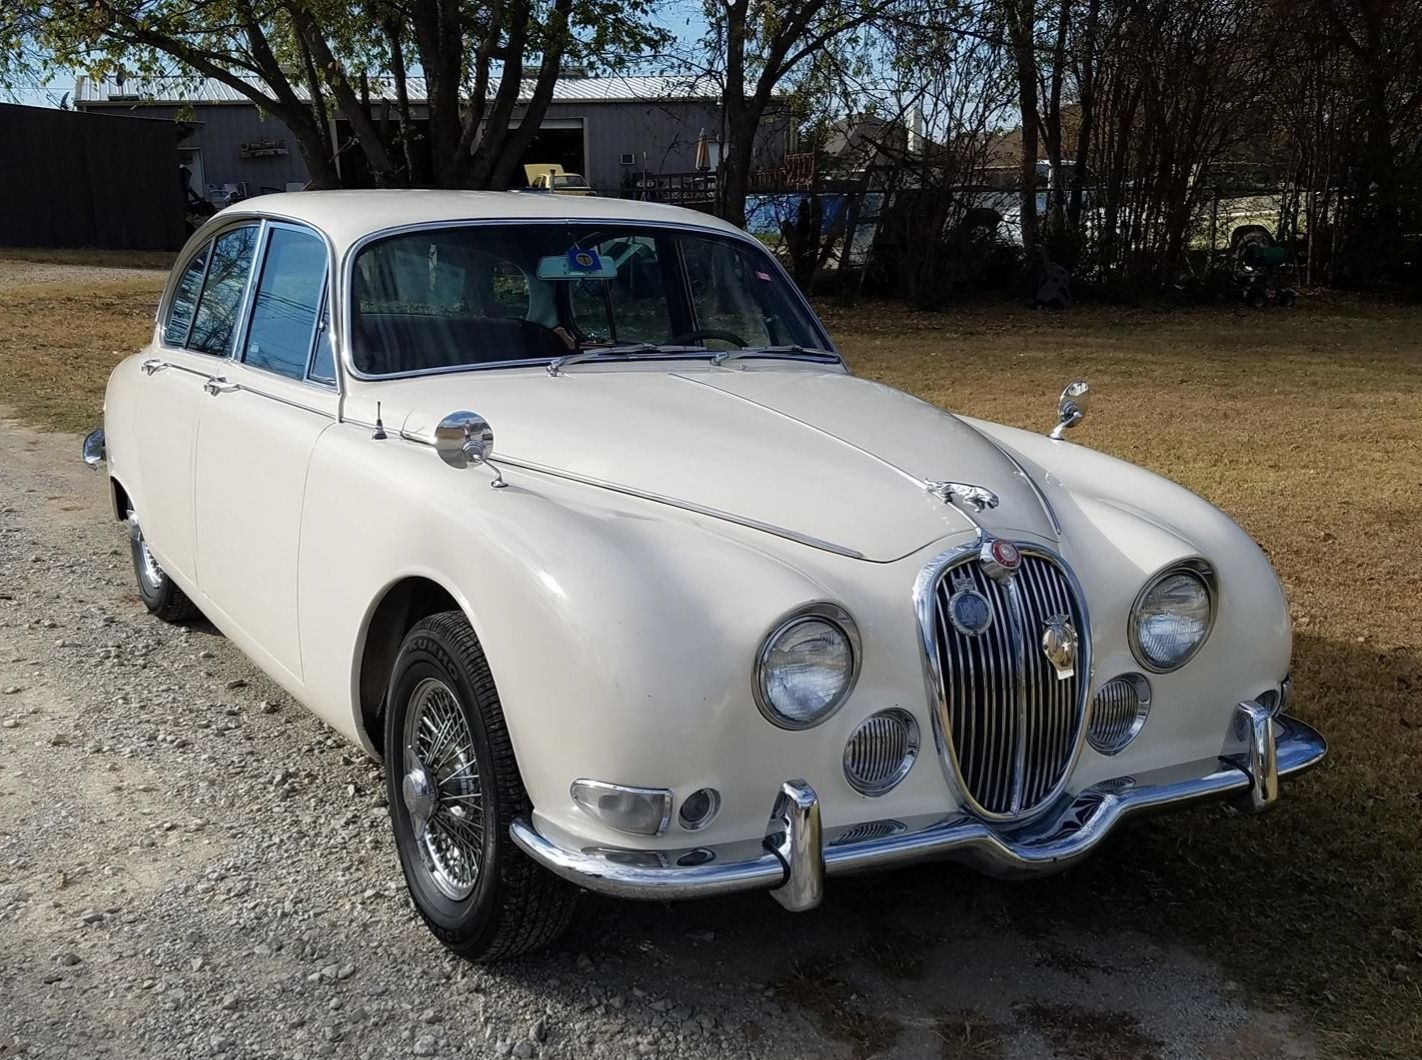 1966 Jaguar S-Type 4-Speed (With images)   Jaguar s type ...